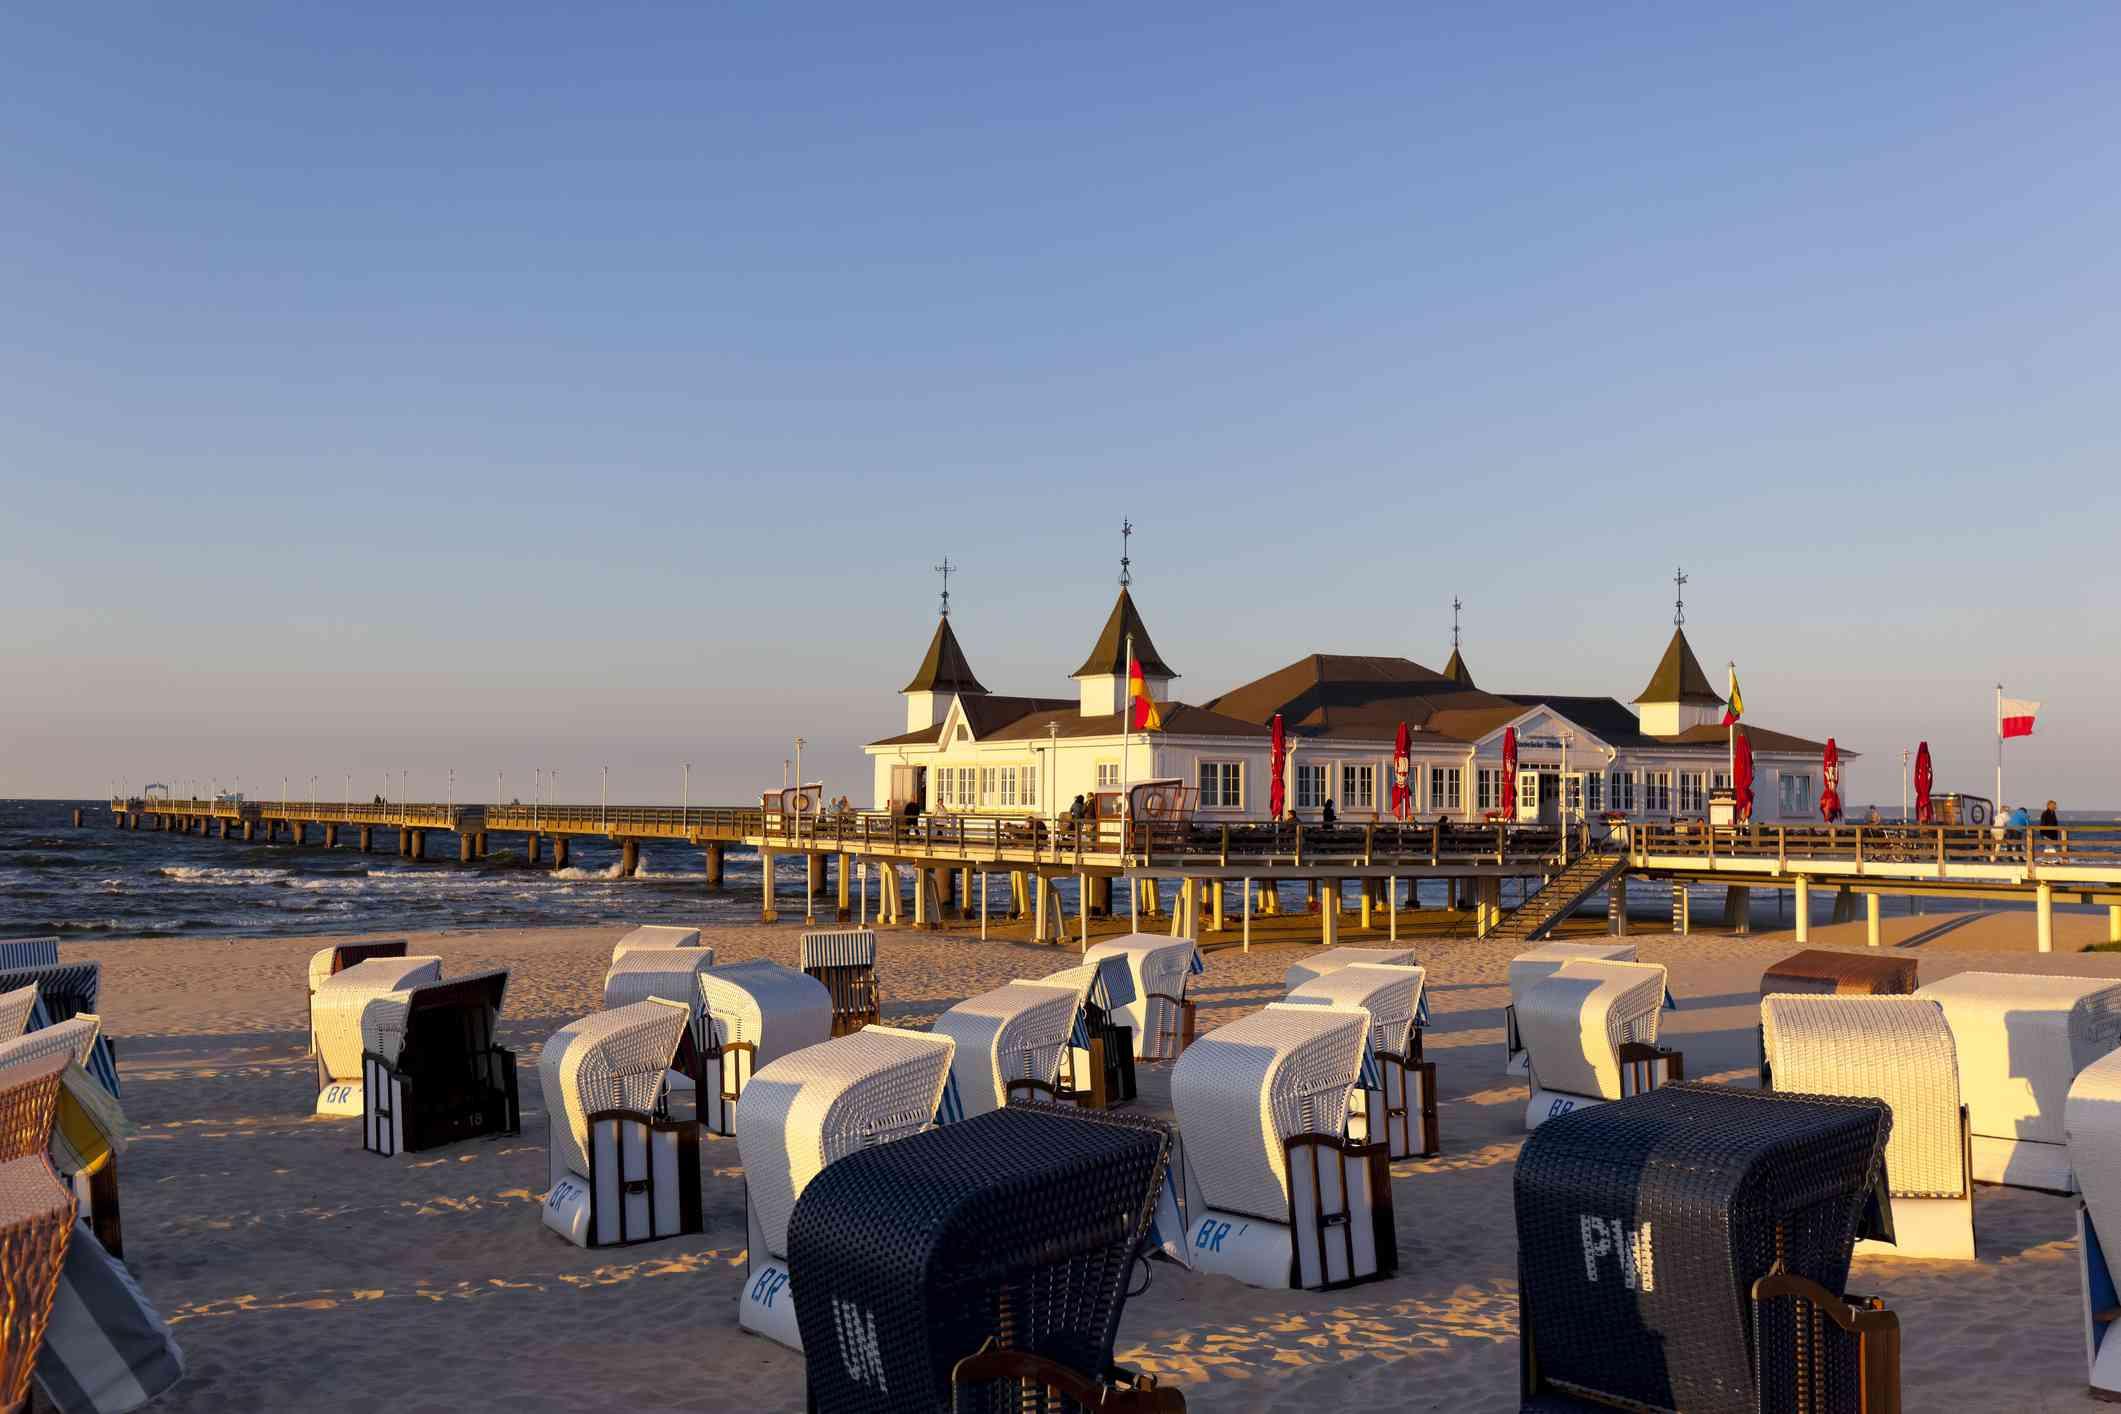 Germany, Usedom Island, Ahlbeck, sea bridge and beach chairs